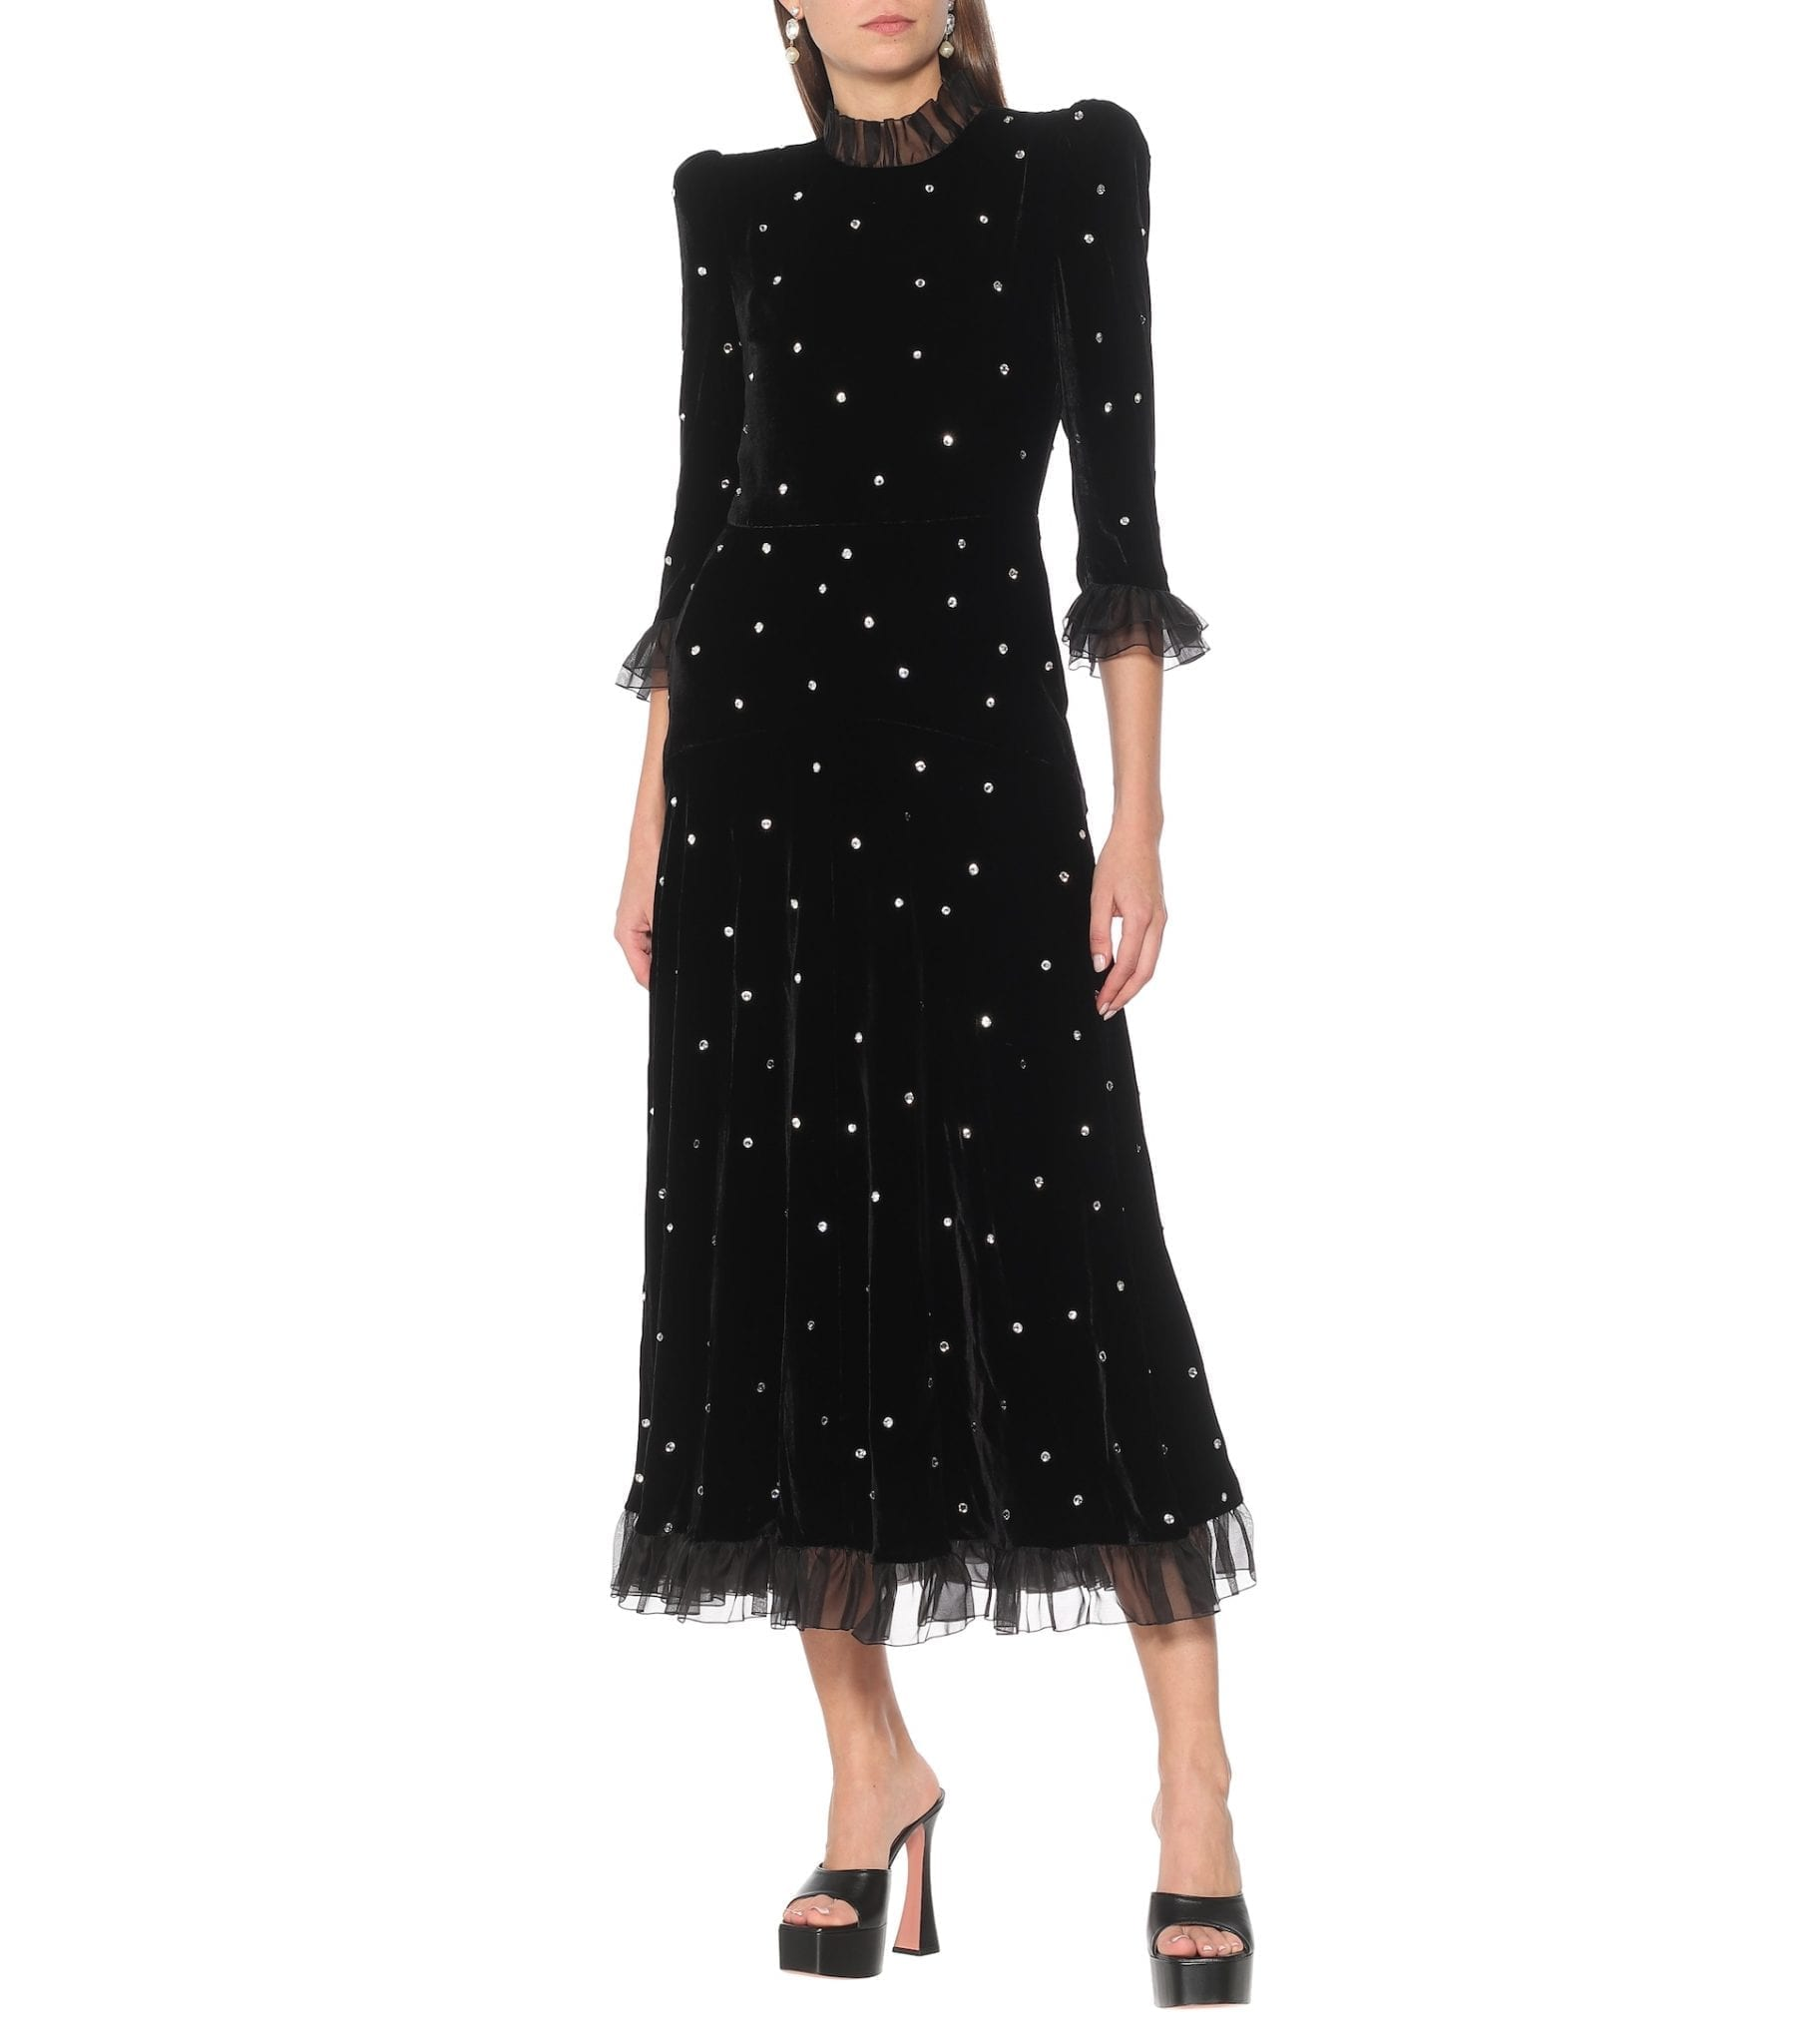 PHILOSOPHY DI LORENZO SERAFINI Embellished Velvet Midi Dress